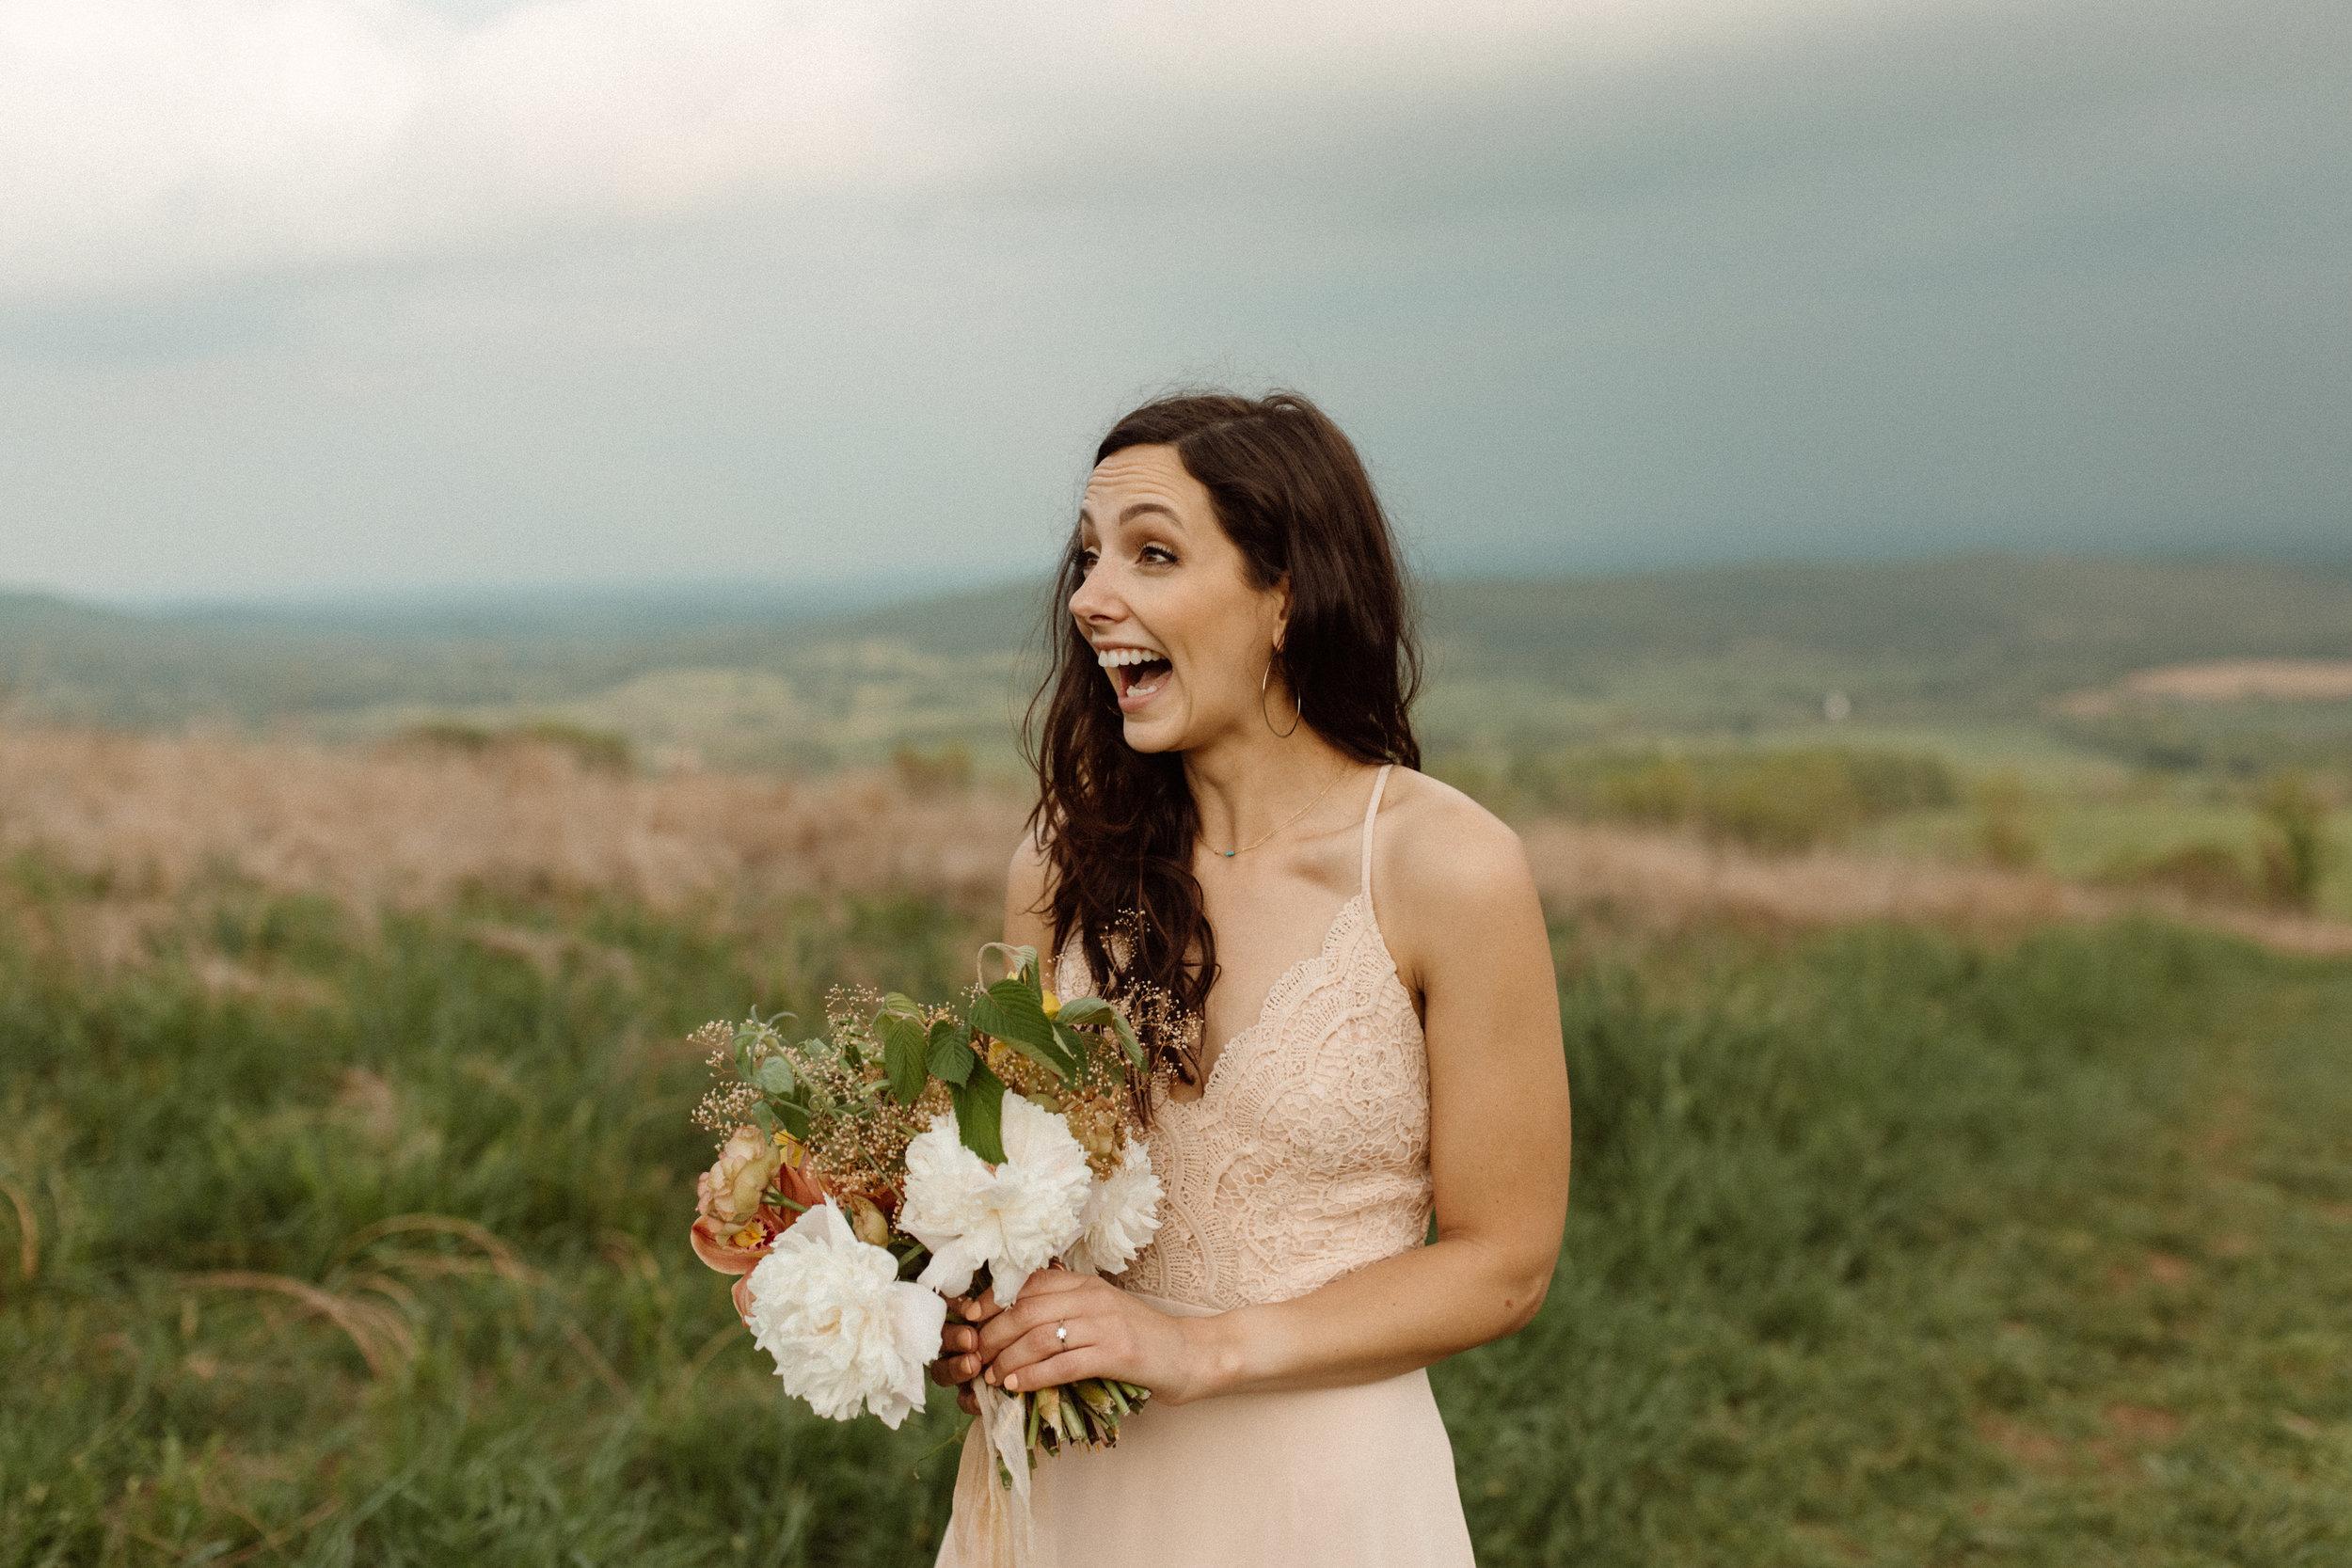 kelsey&mark-engagement-skymeadows-2019-peytoncurry-0014.jpg